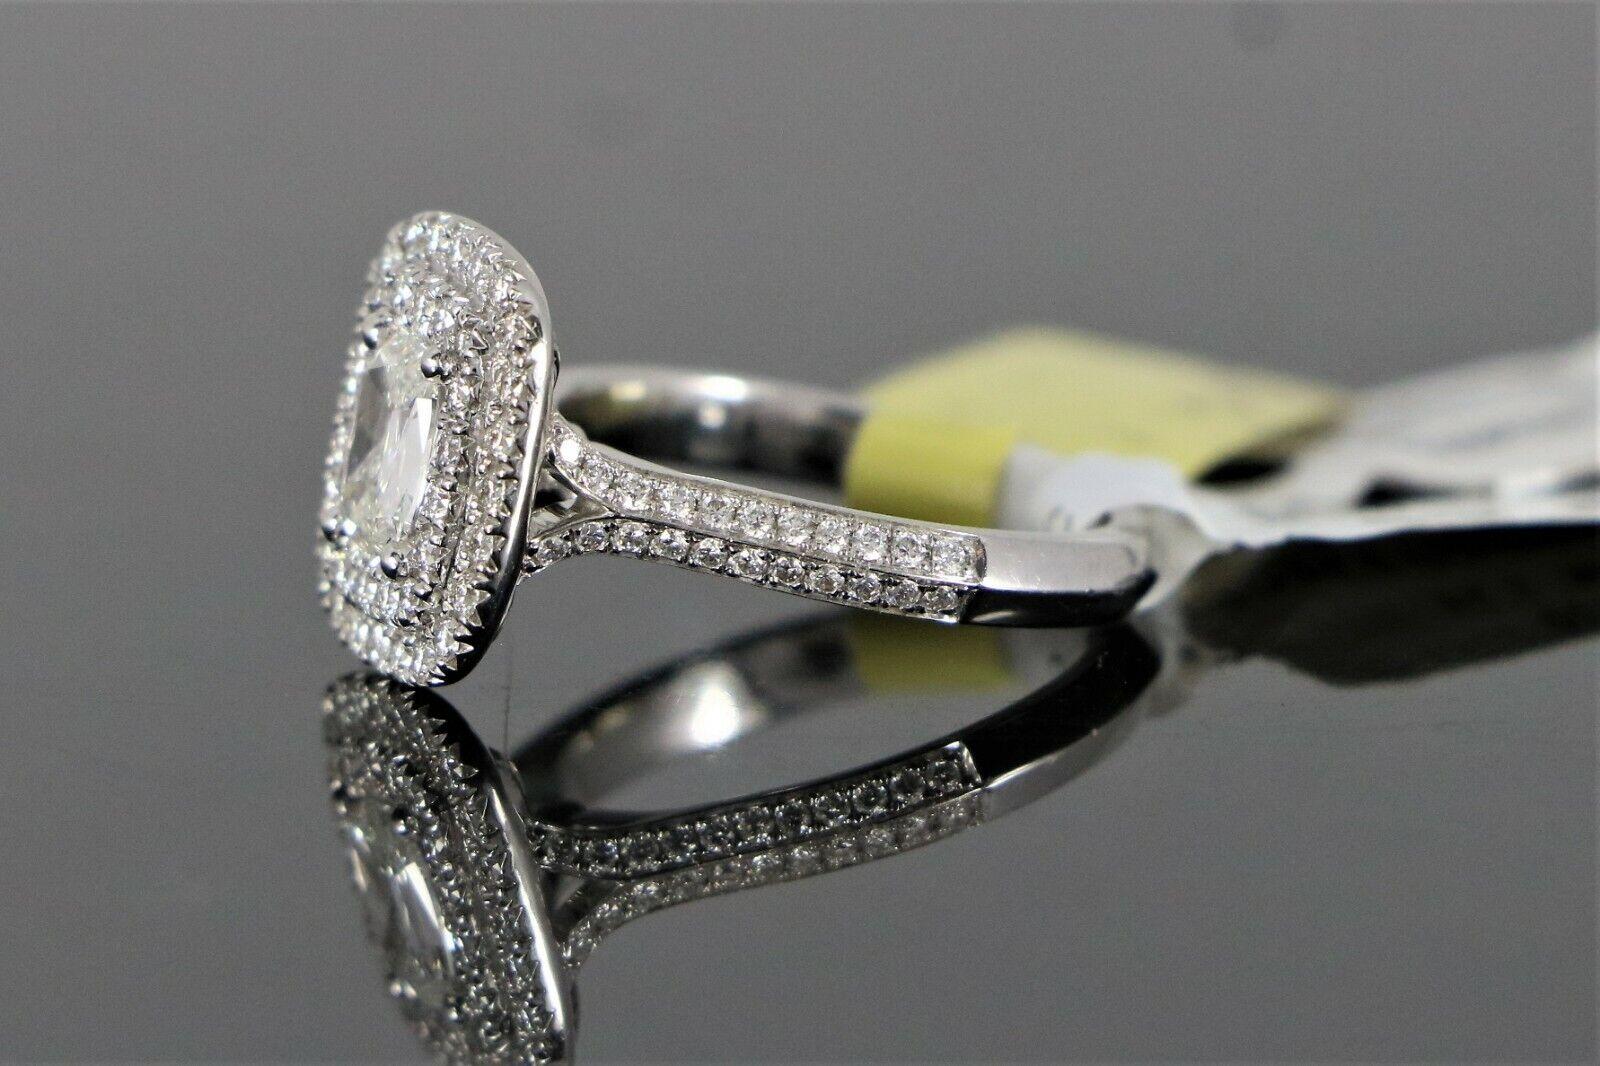 $5,150 S&S 14K White Gold 1.14ct GIA SI2 Cushion Diamond Halo Engagement Ring 6 6